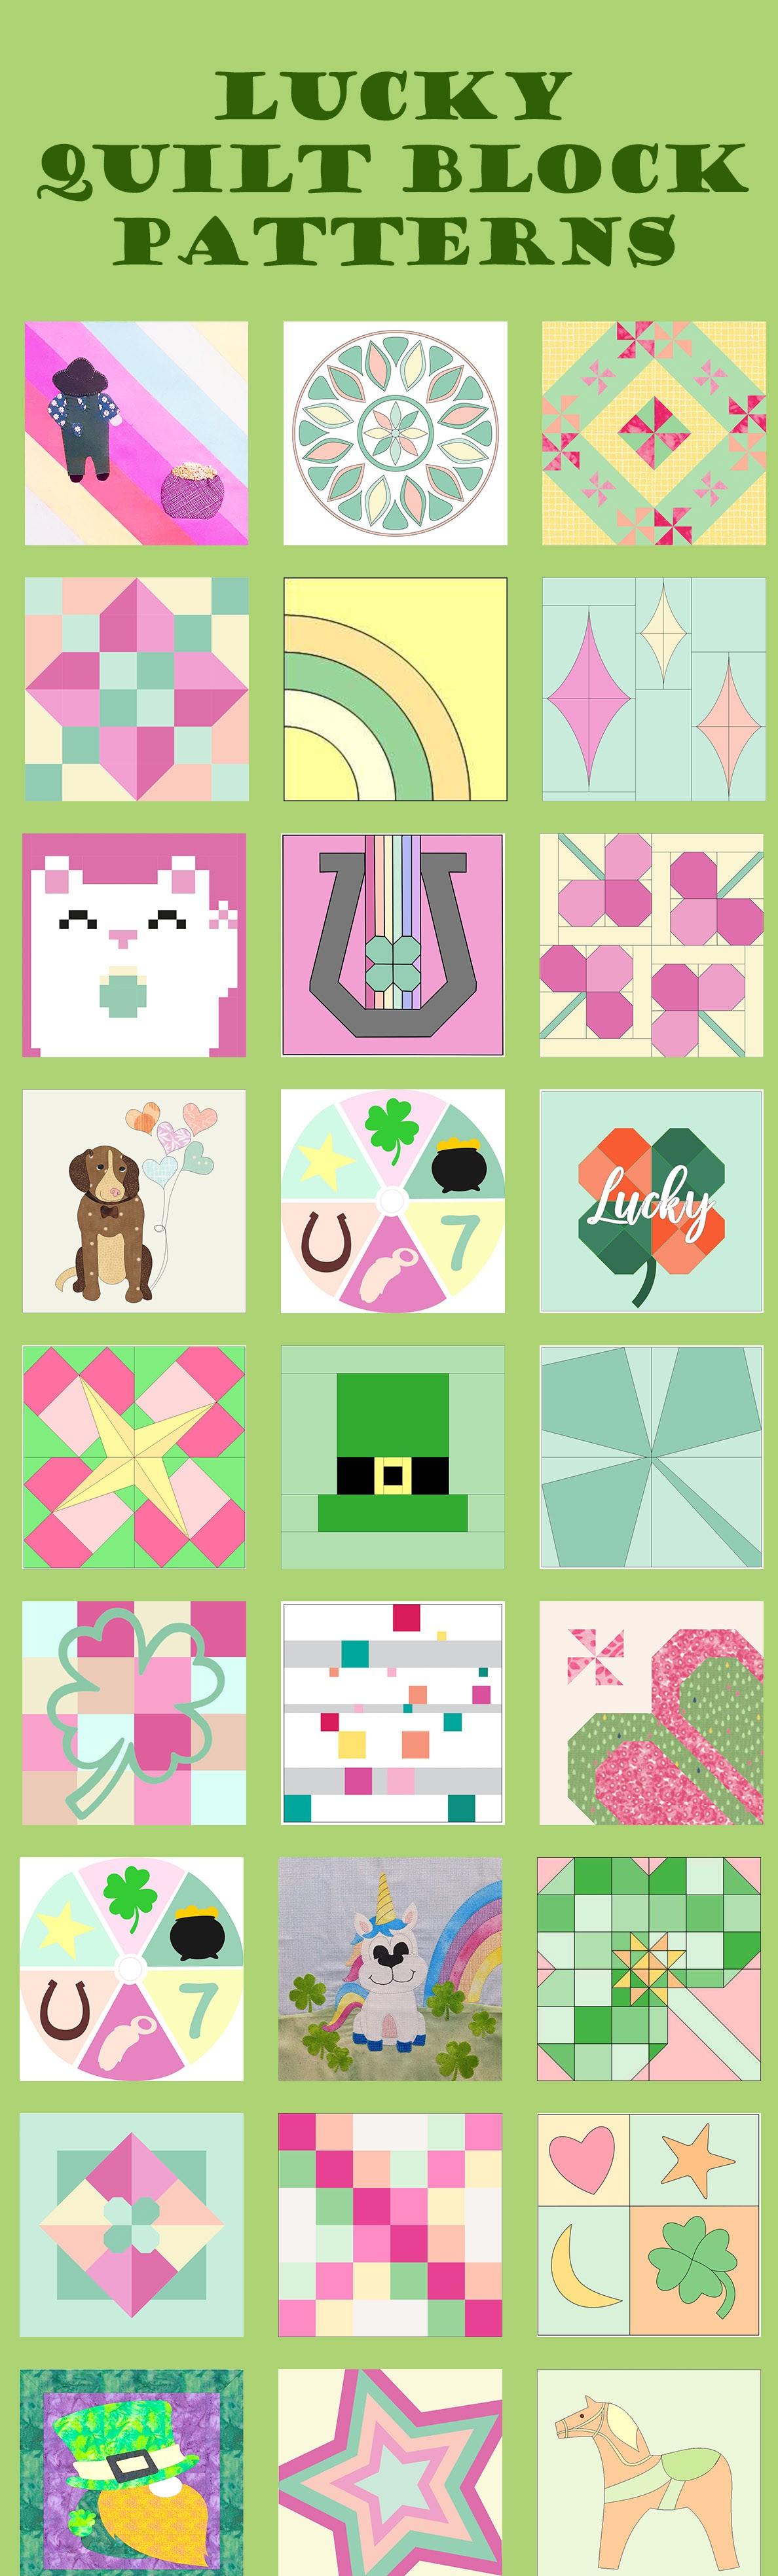 Quilt Block Mania February Collage Image